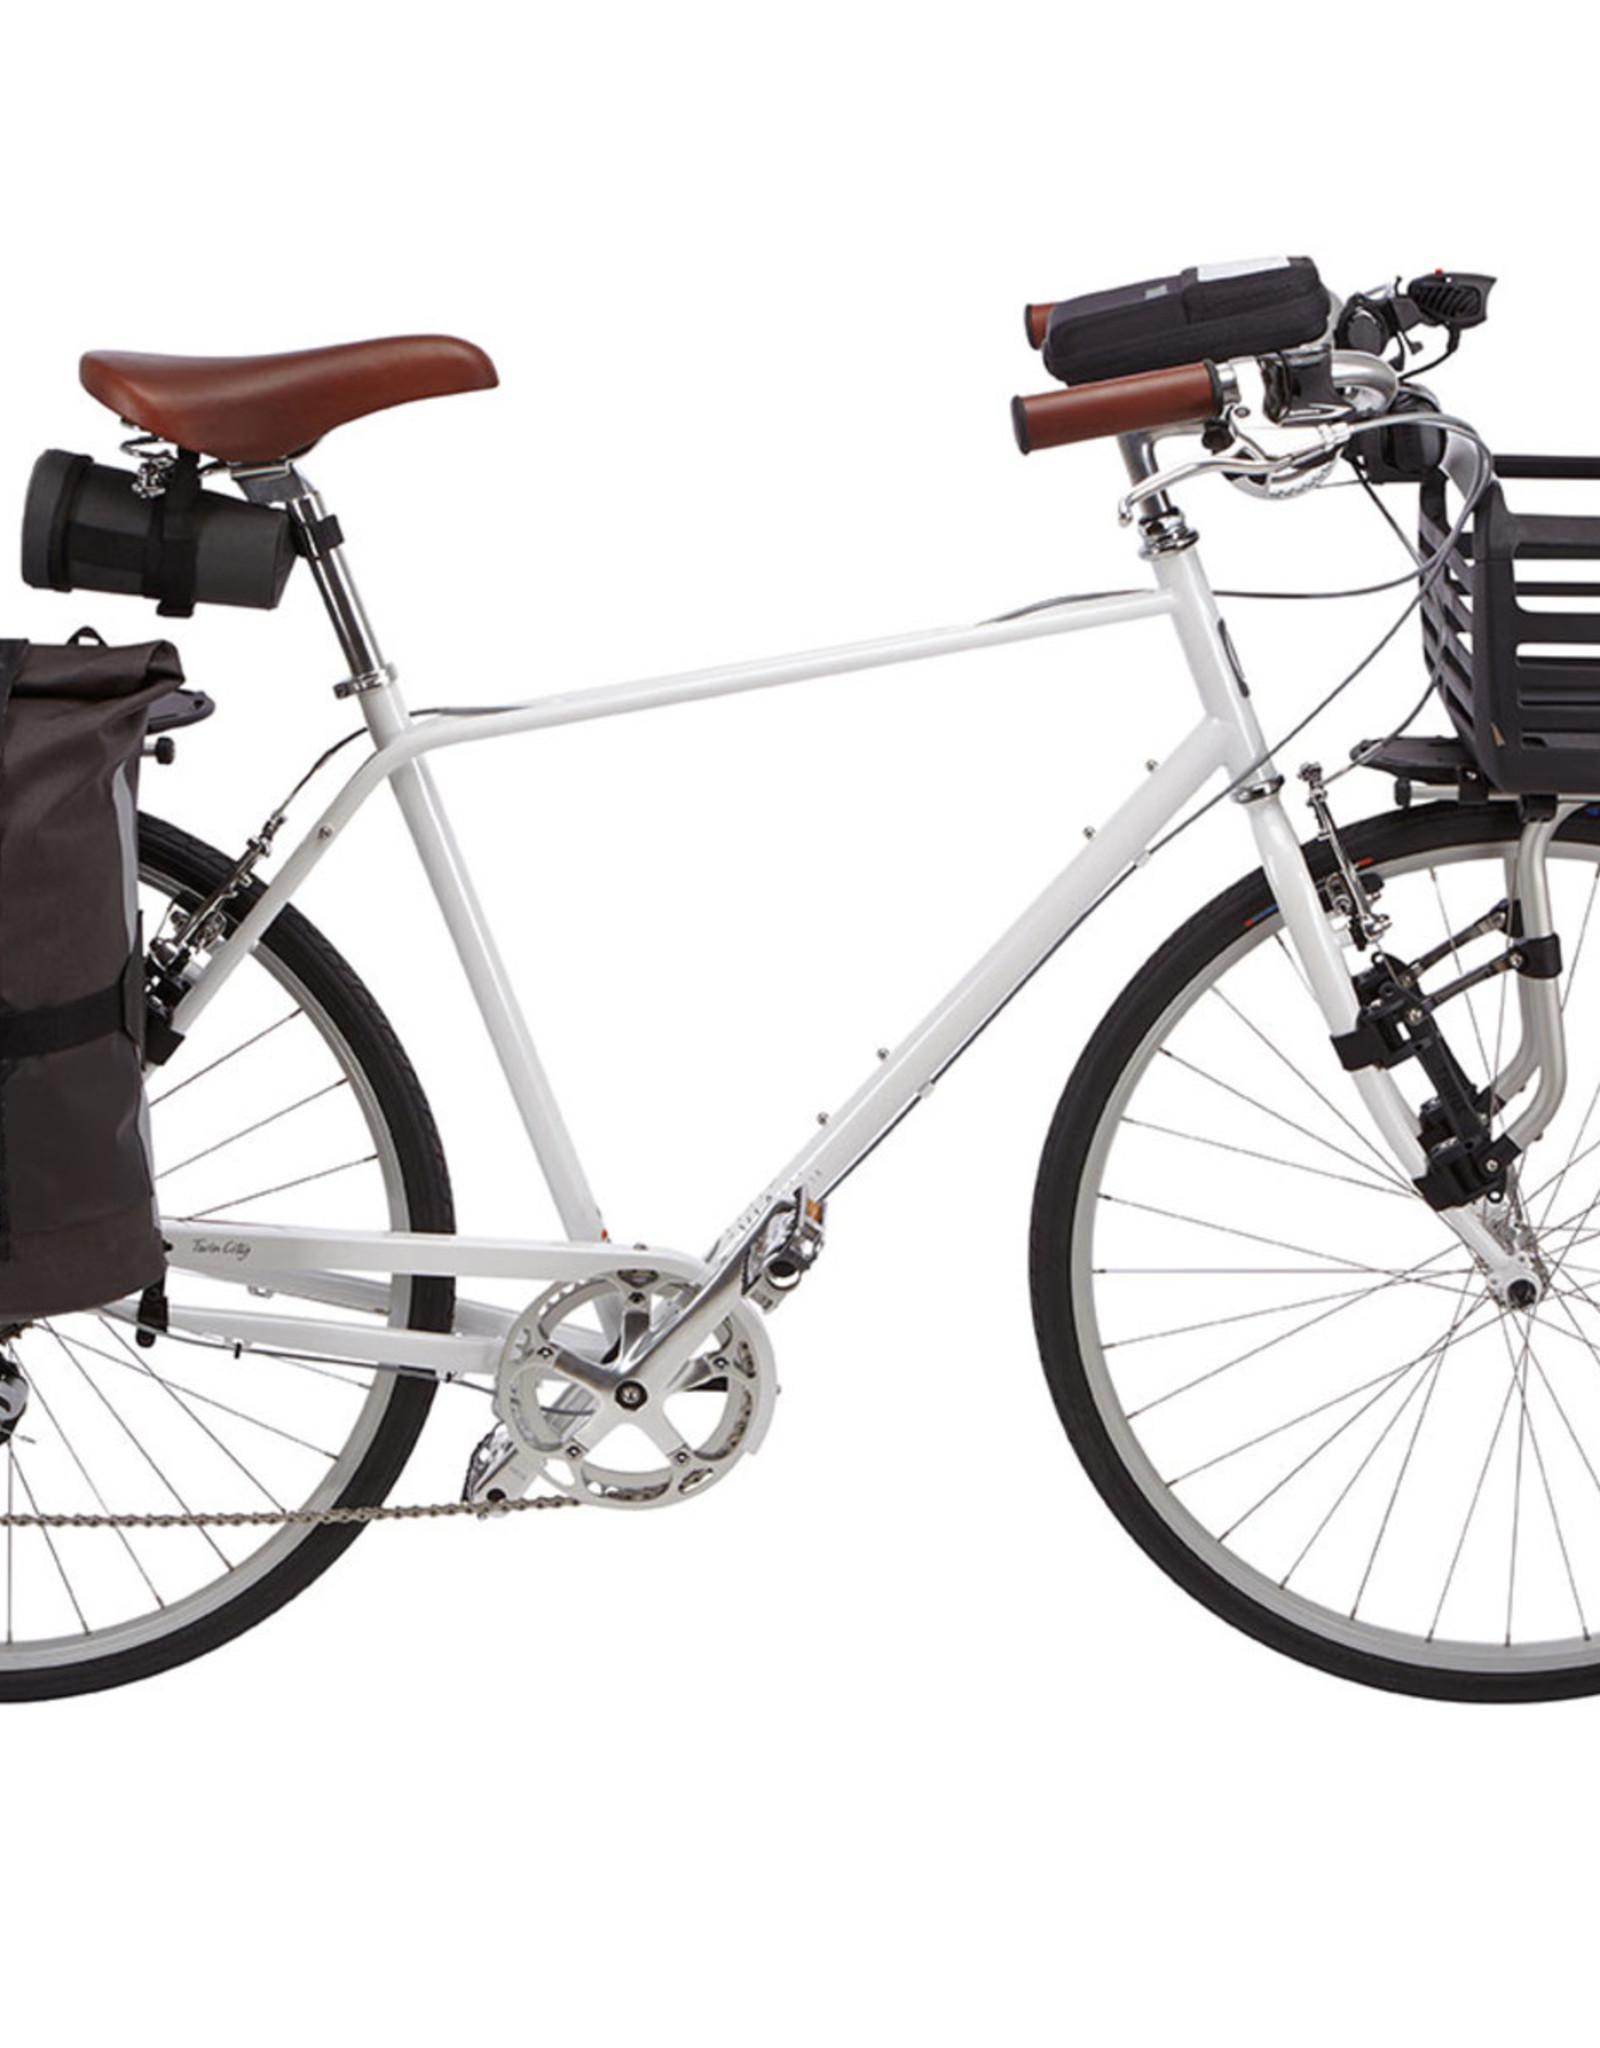 THULE THULE Porte-Bagage Pack n Pedal Tour Rack